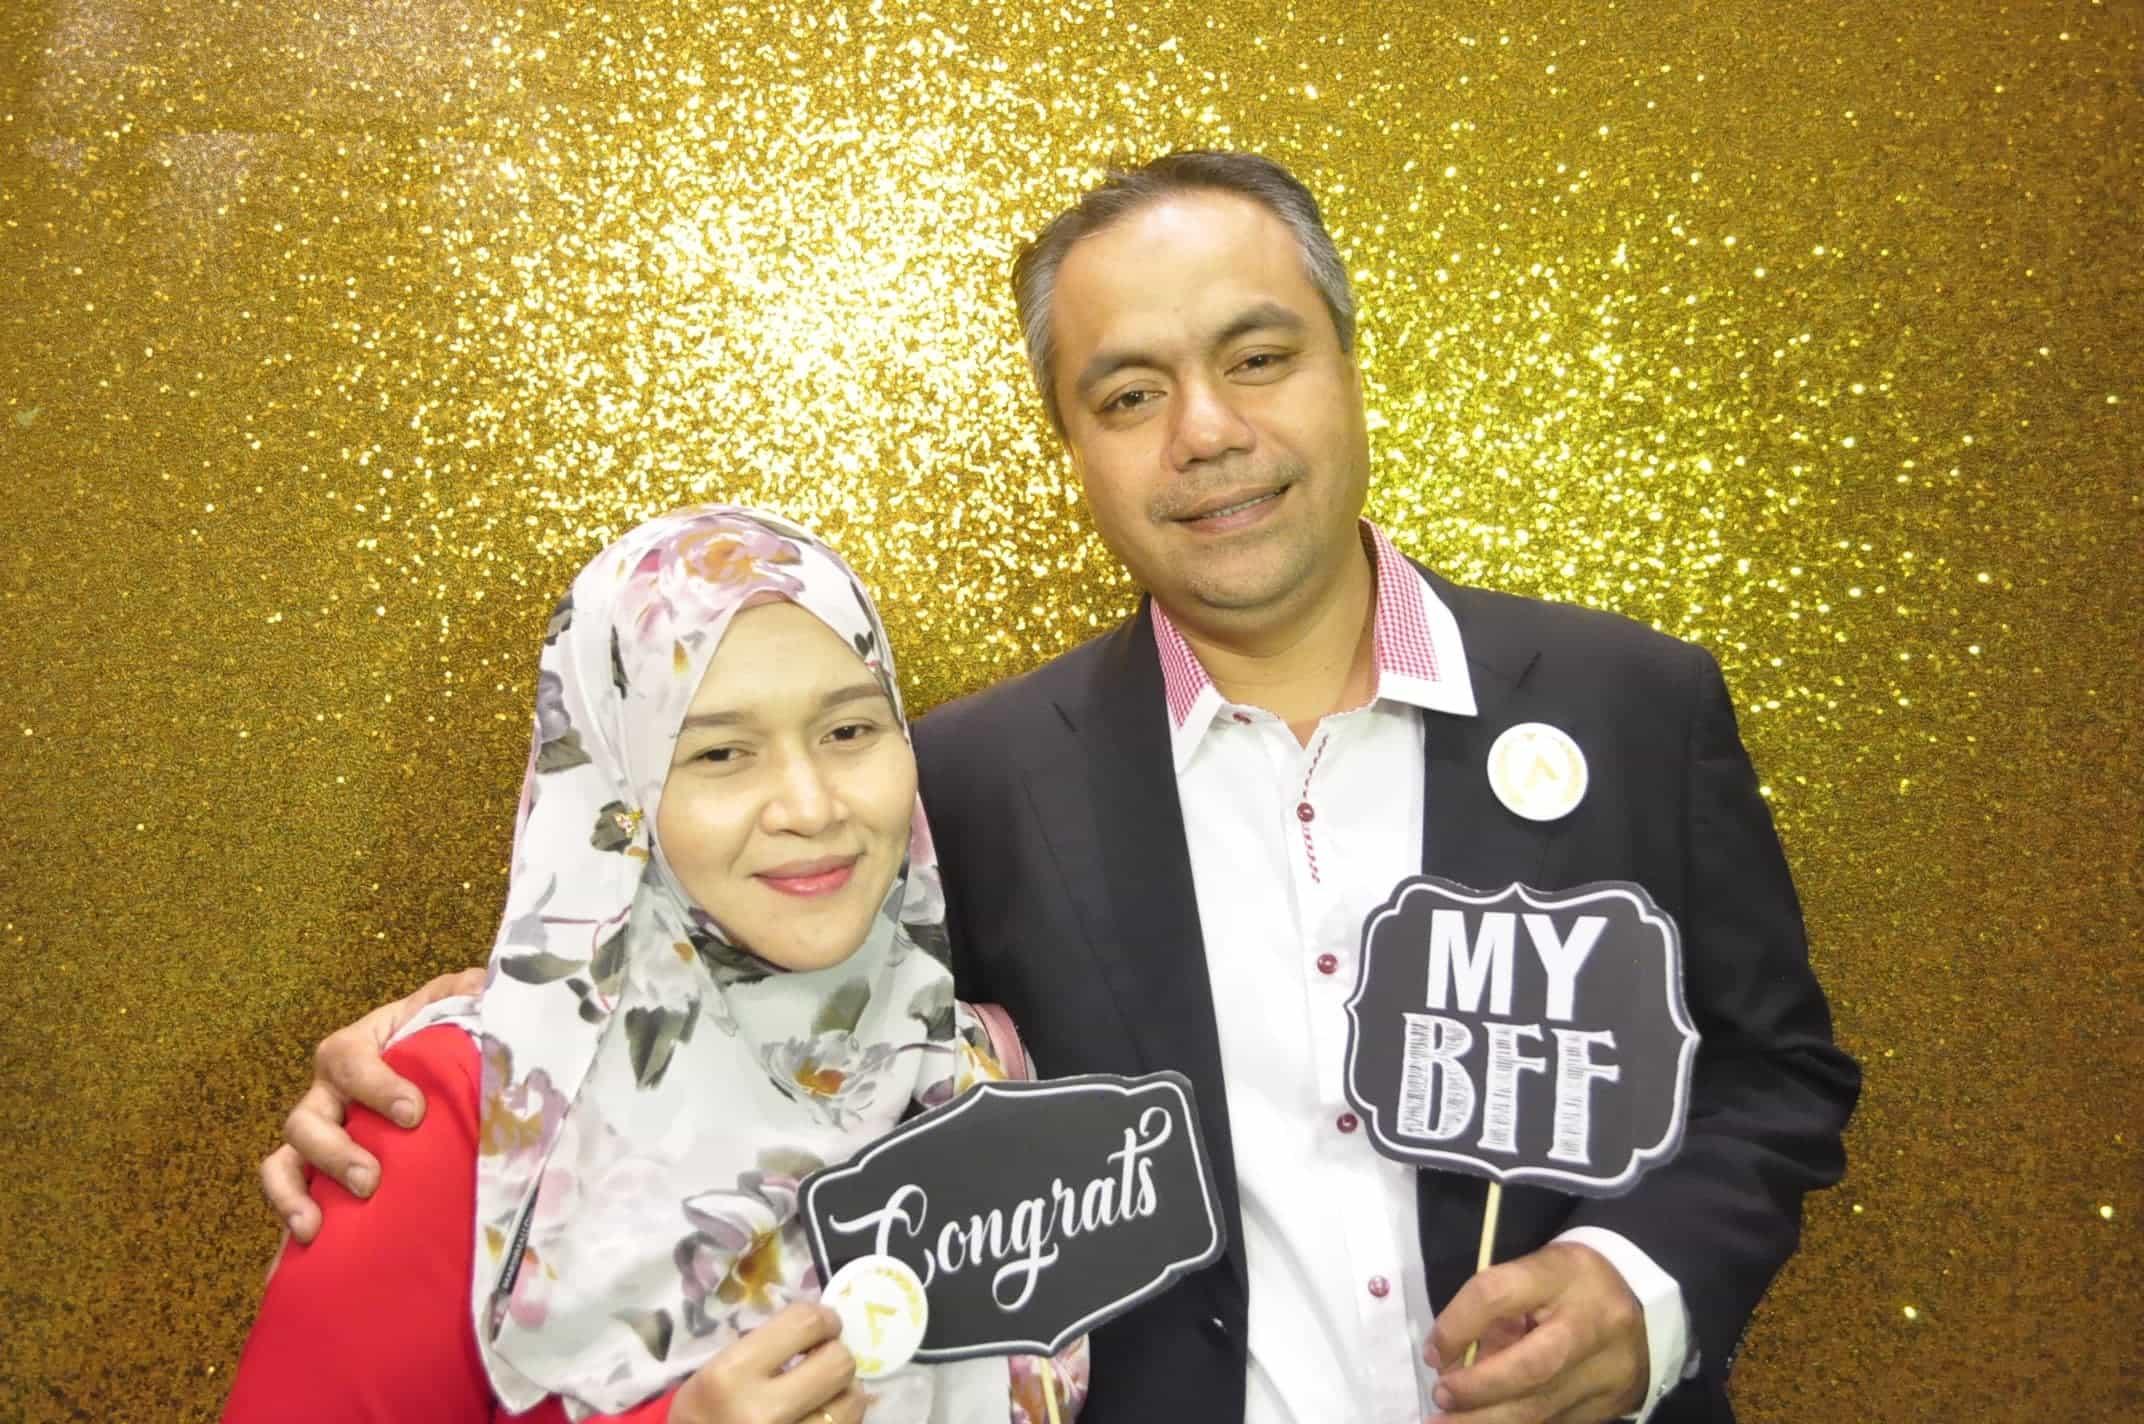 Malam Gala Anggun 2018 (Photobooth) 16